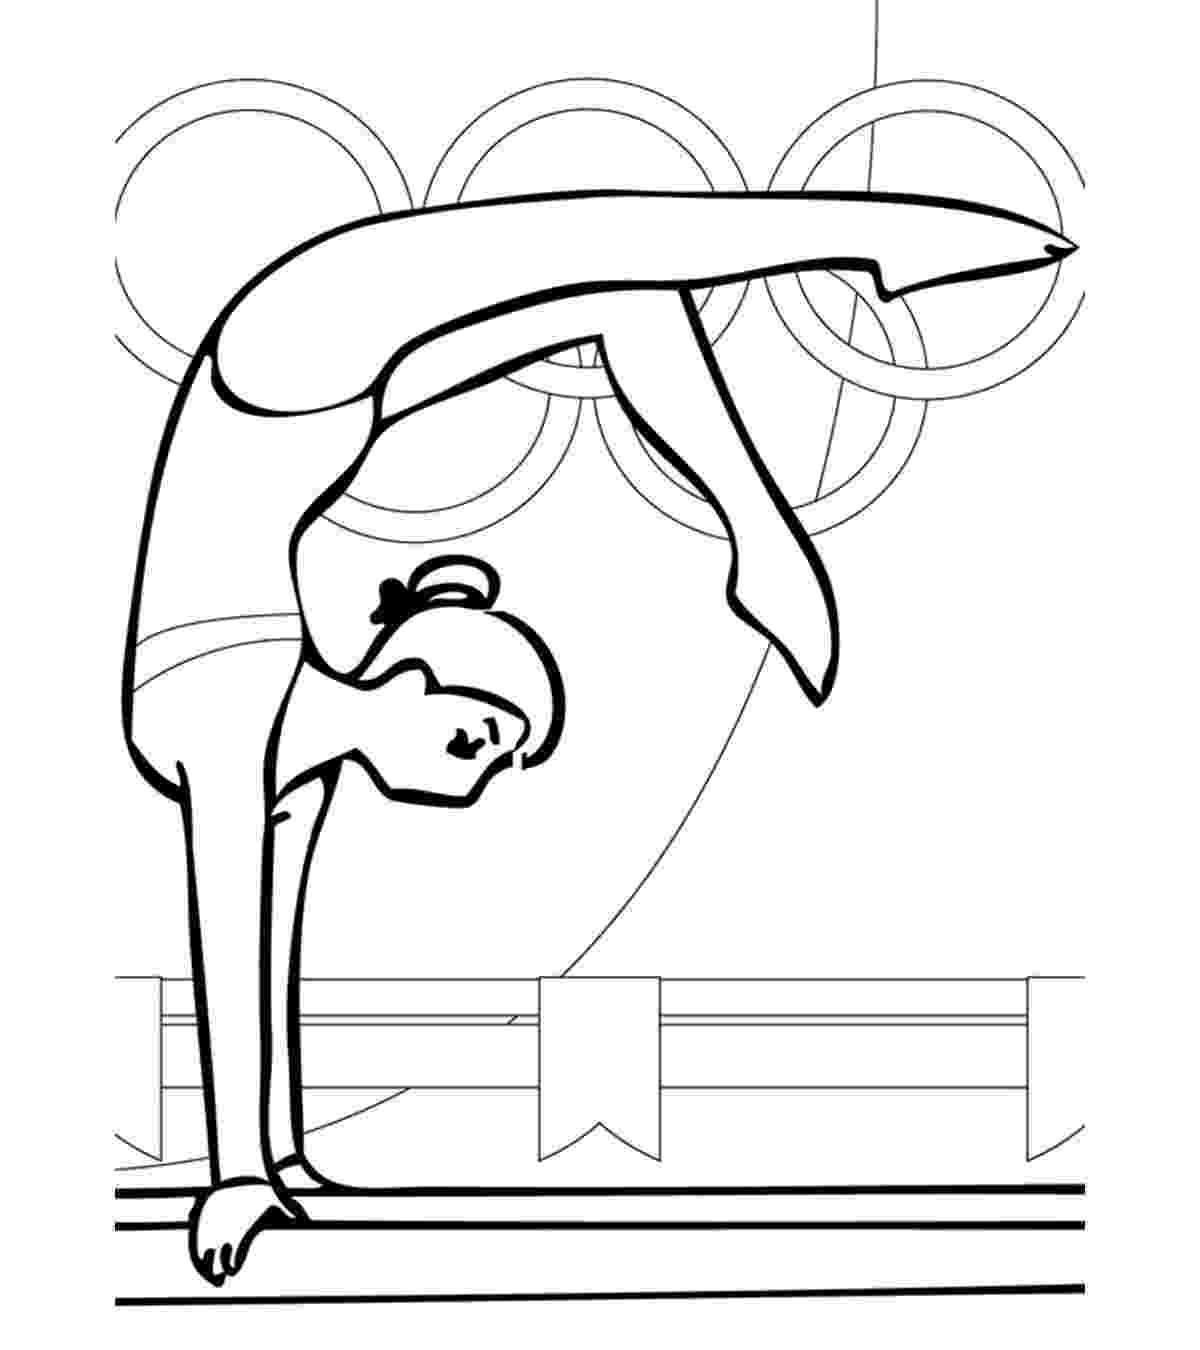 free sports coloring sheets sports coloring pages clipart panda free clipart images sports coloring free sheets